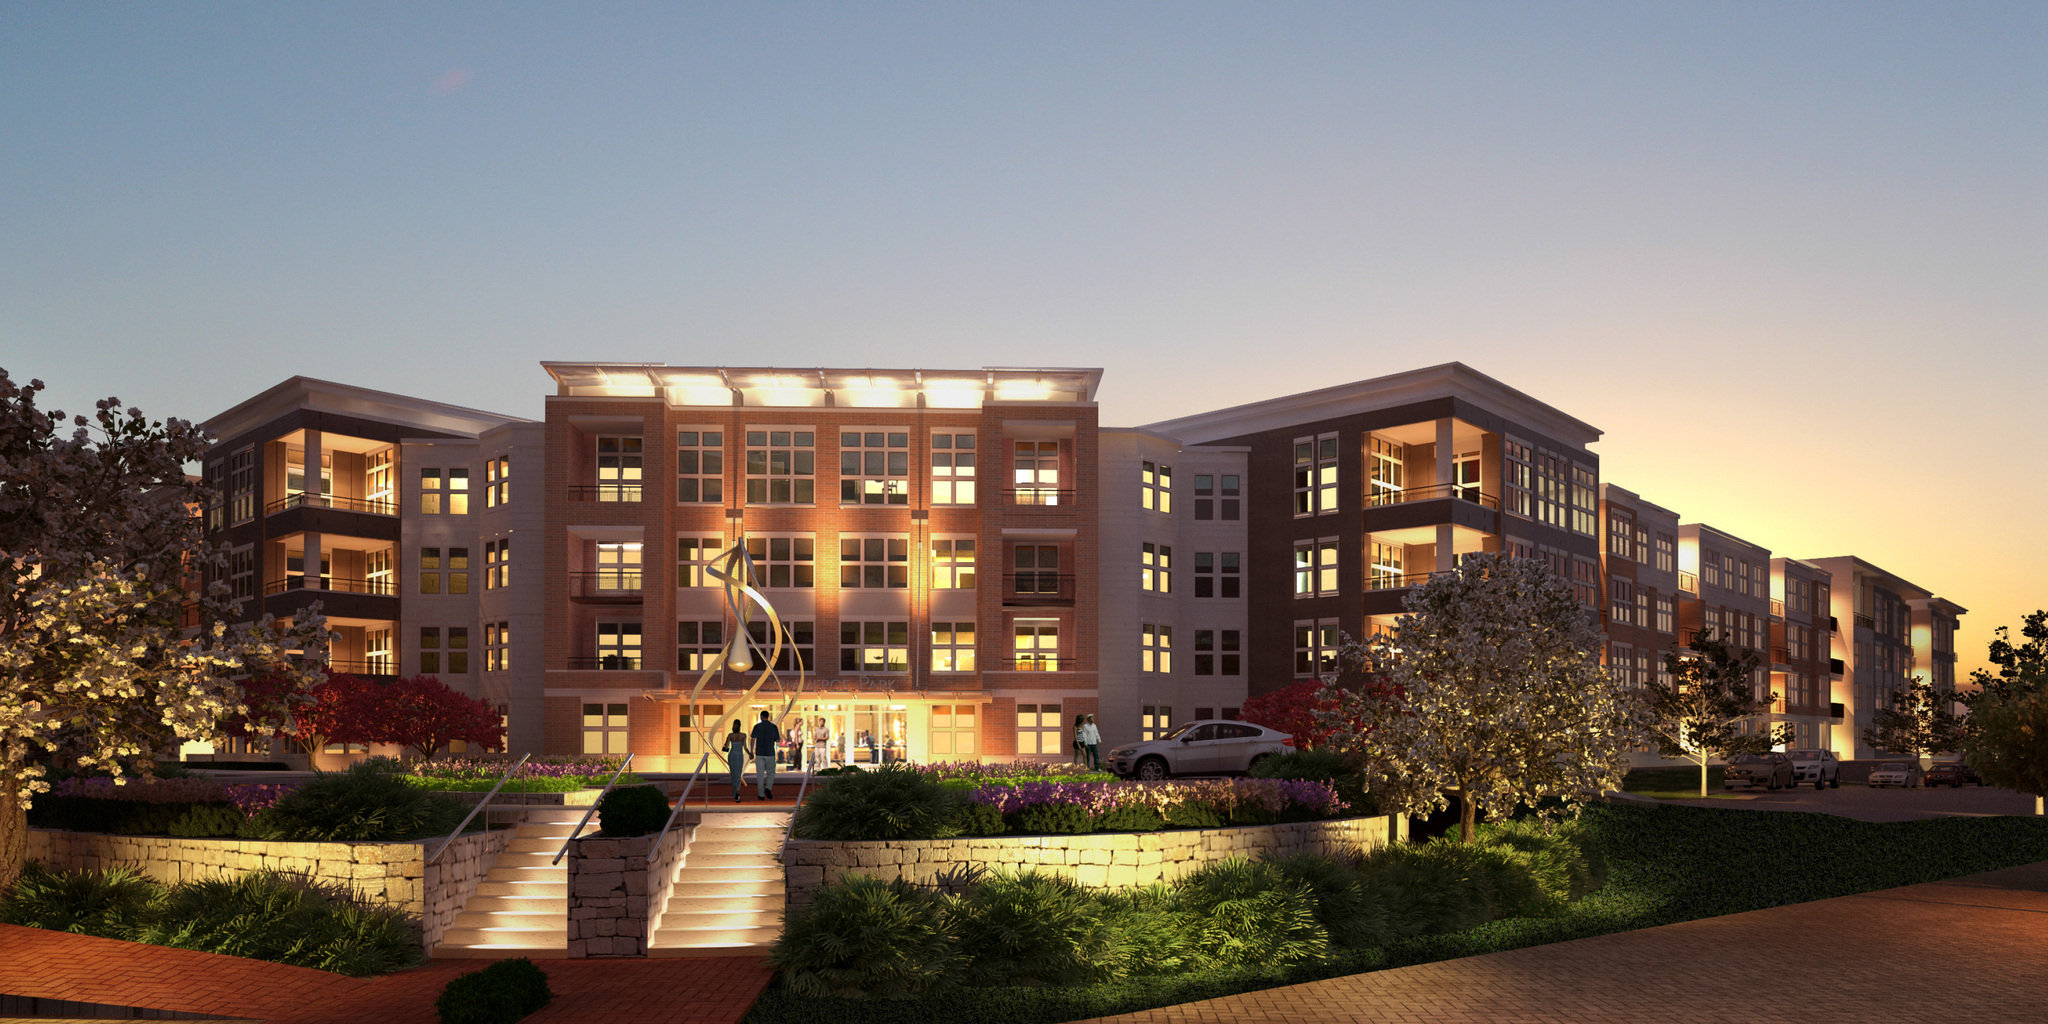 the-vue-beachwood-apartments-exterior-dc402e1be7d3f57e.jpg